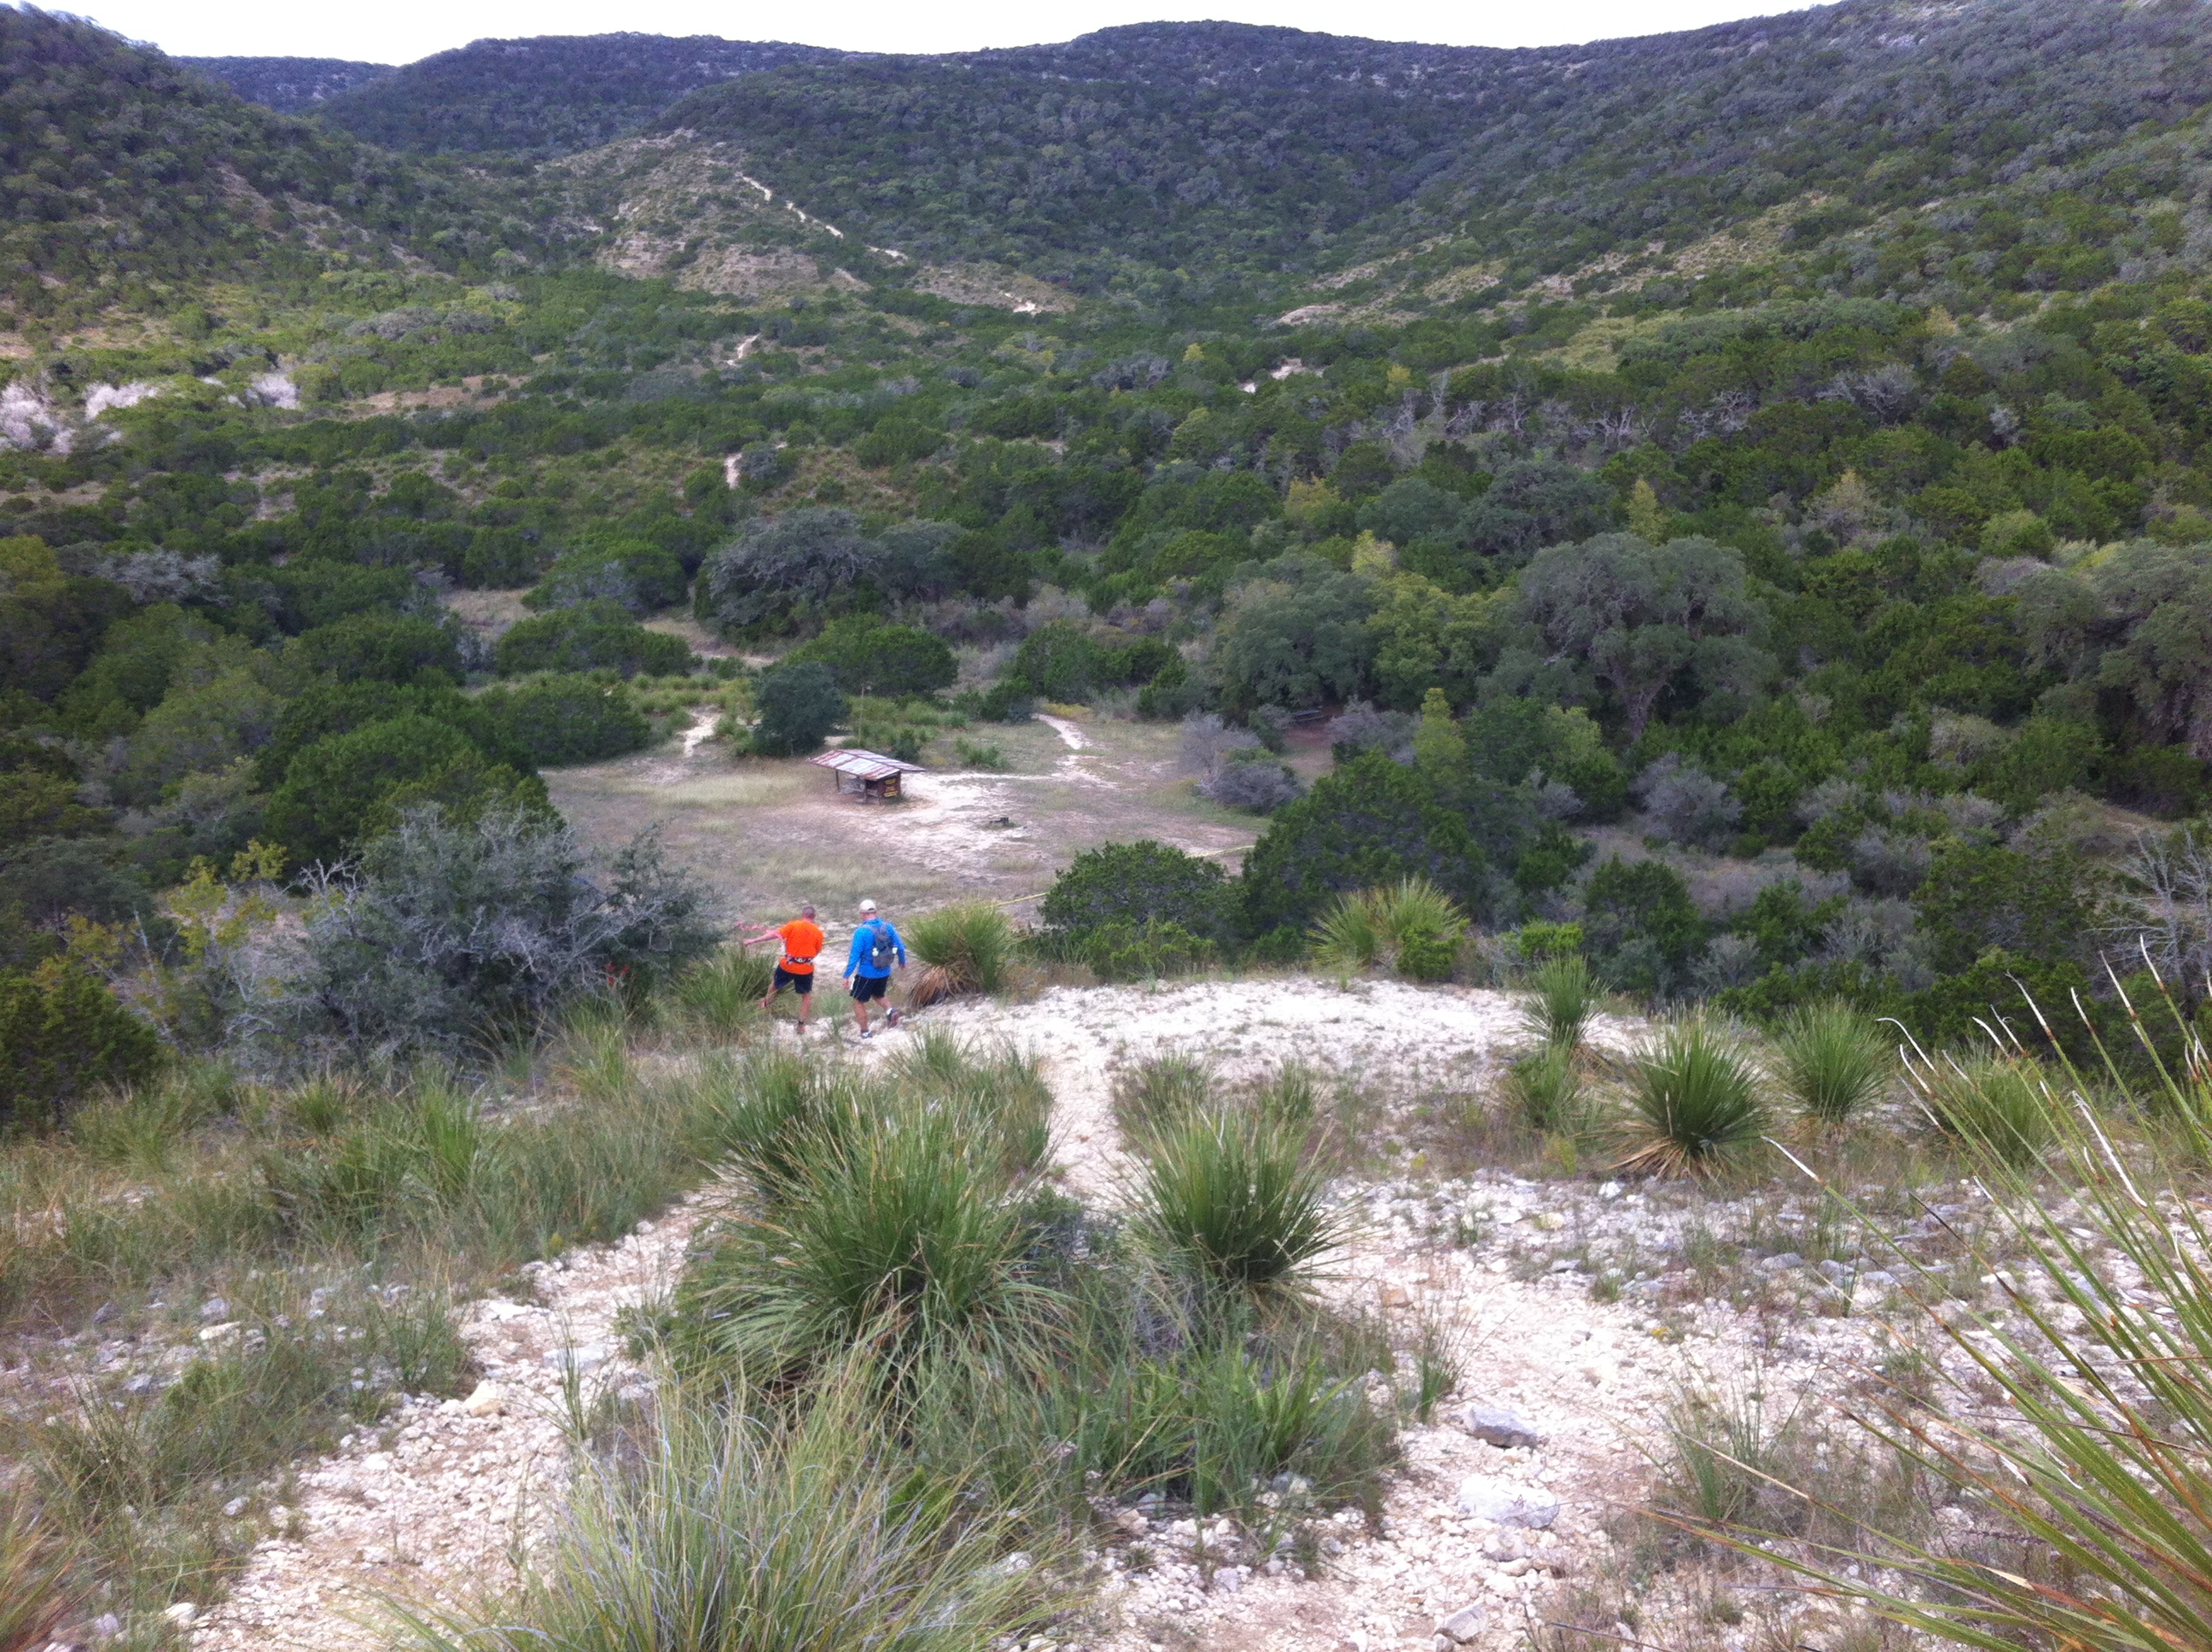 cactus rose ultra trail run relay